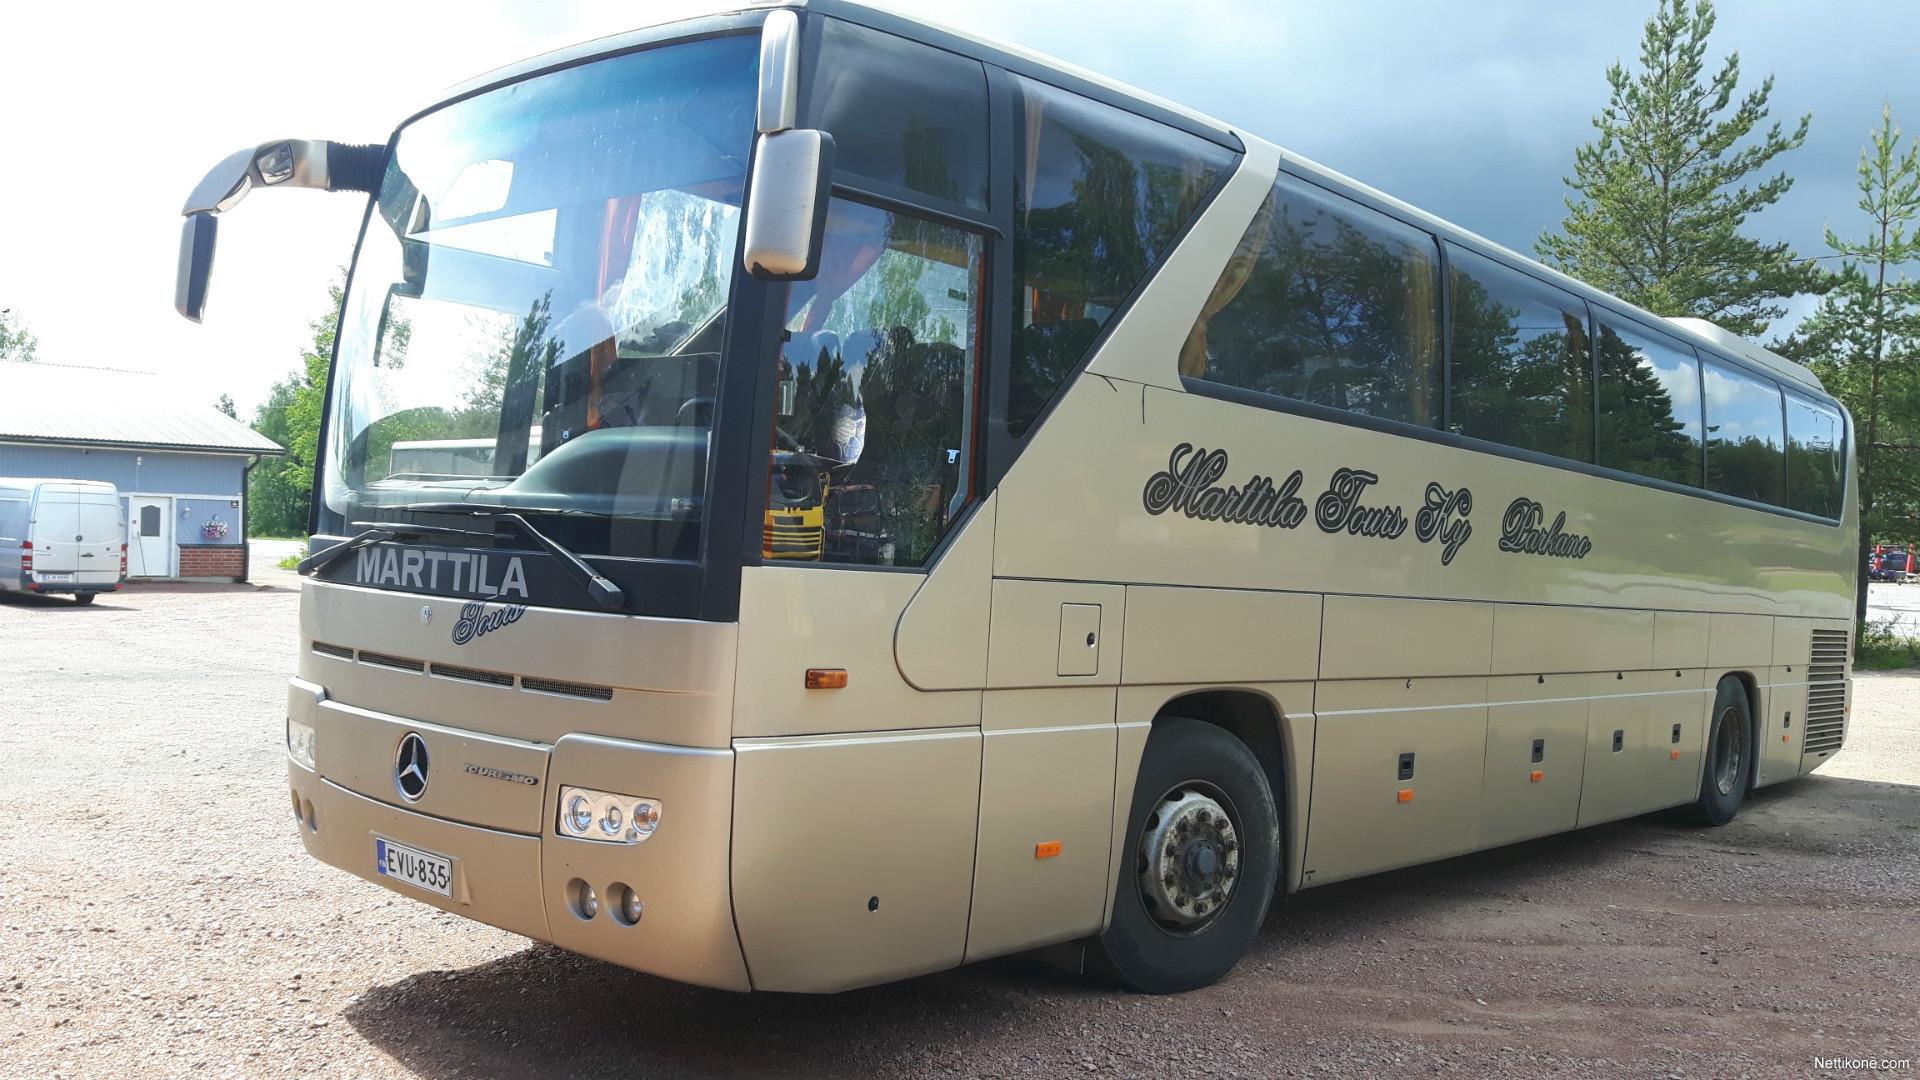 Mercedes benz tourismo bus coach 2004 nettikone for Mercedes benz tourismo coach